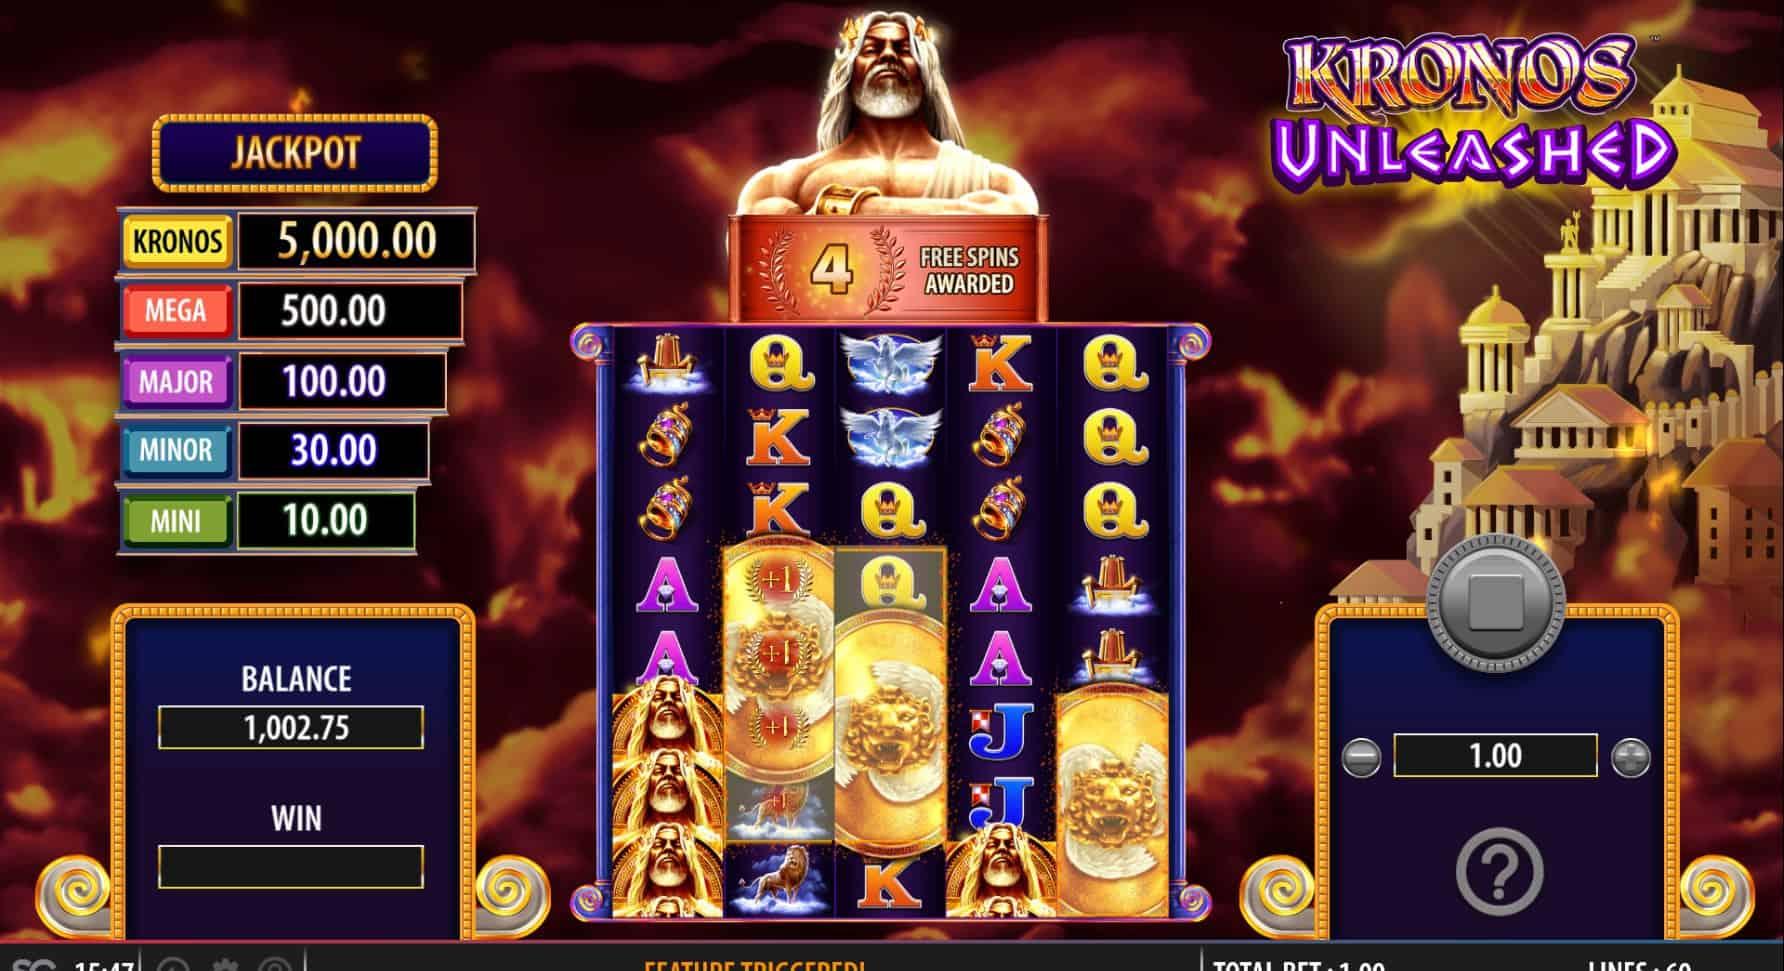 sginteractive-kronosunleashed-free spins-casinogroundsdotcom